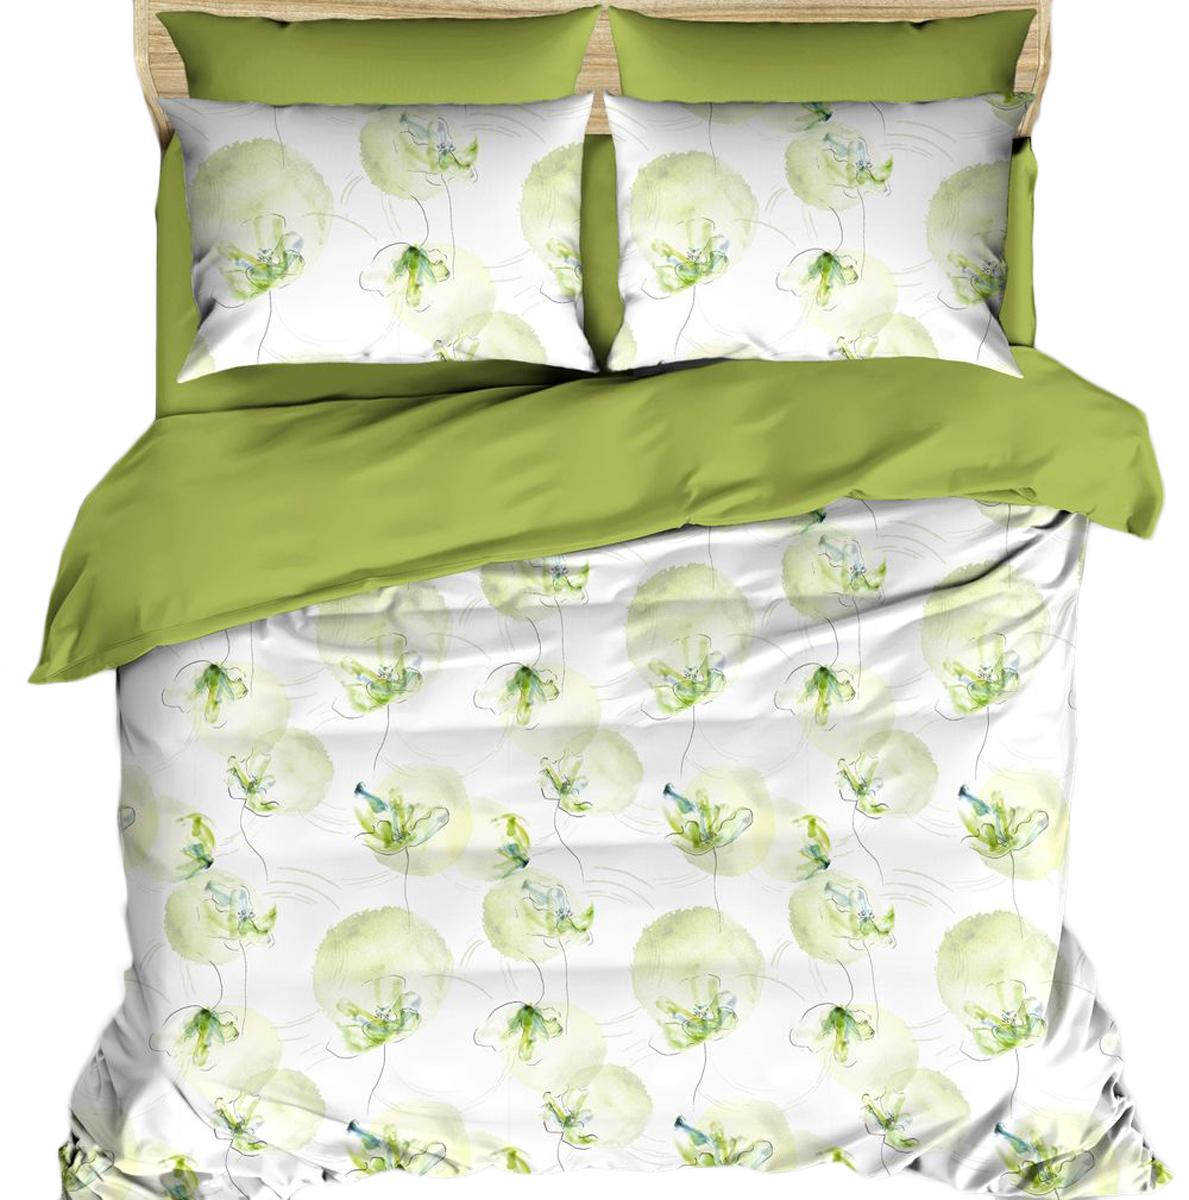 Комплект постельного белья Василиса Будто случайно, евро, наволочки 70x70;50x70. 163545 комплекты белья rhs комплект белья